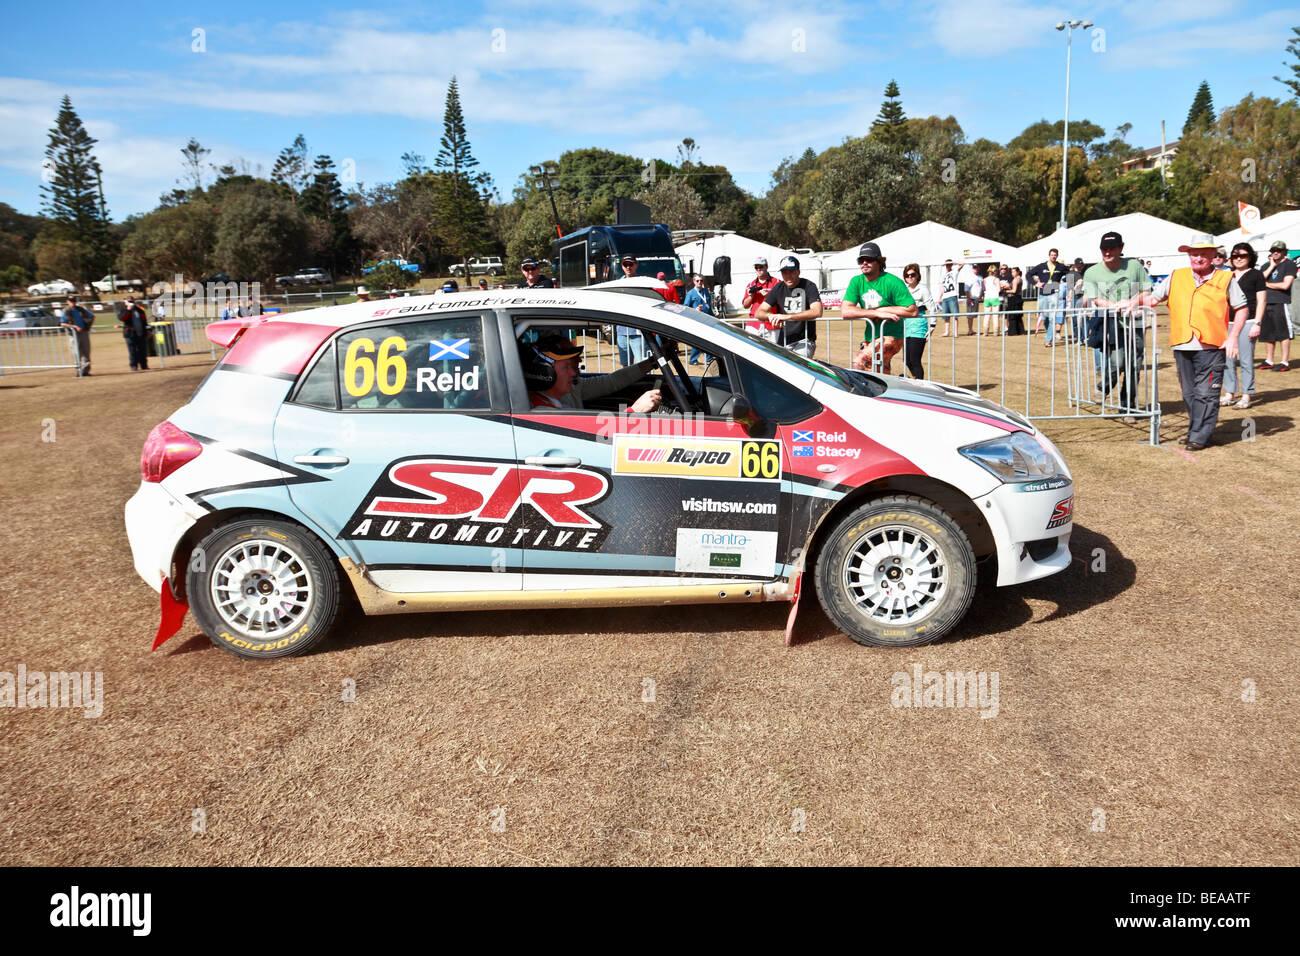 Motorsport: Rallye Australien 2009/WRC Rallye-Auto Einzug in seinen Boxenstopp Stockbild